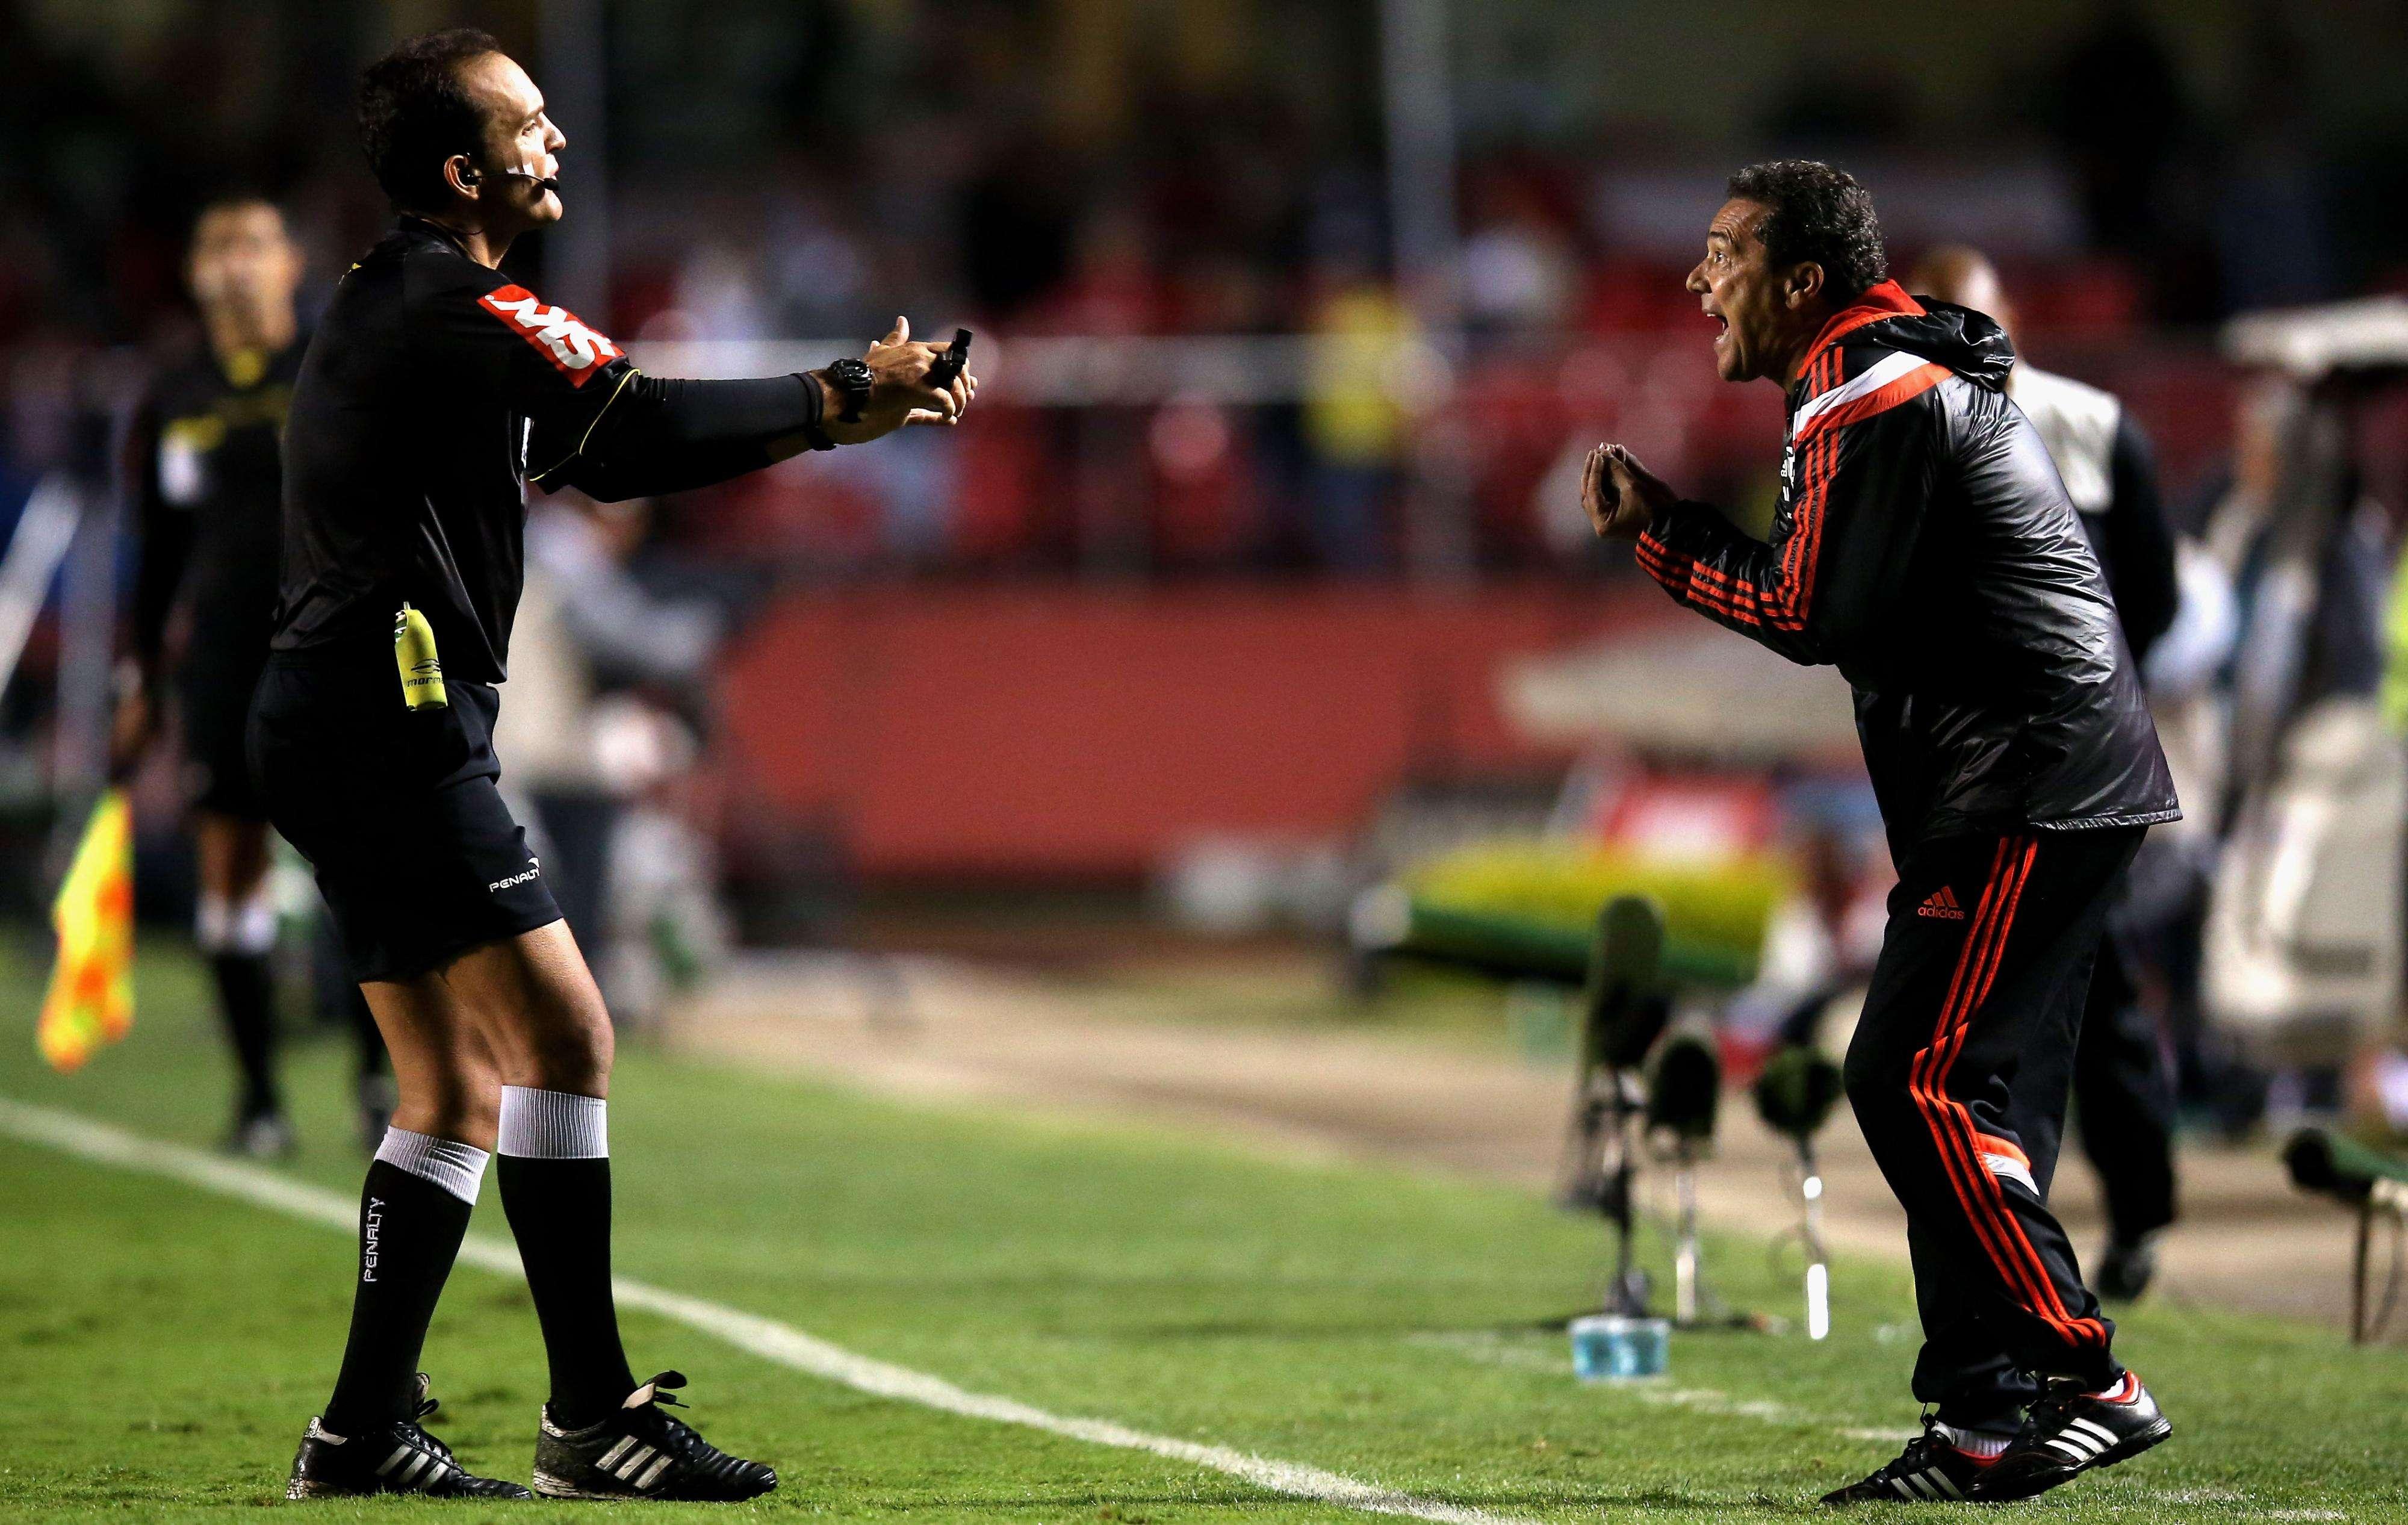 Luxemburgo reclama de árbitro Andre Luiz de Freitas Castro Foto: Friedemann Vogel/Getty Images